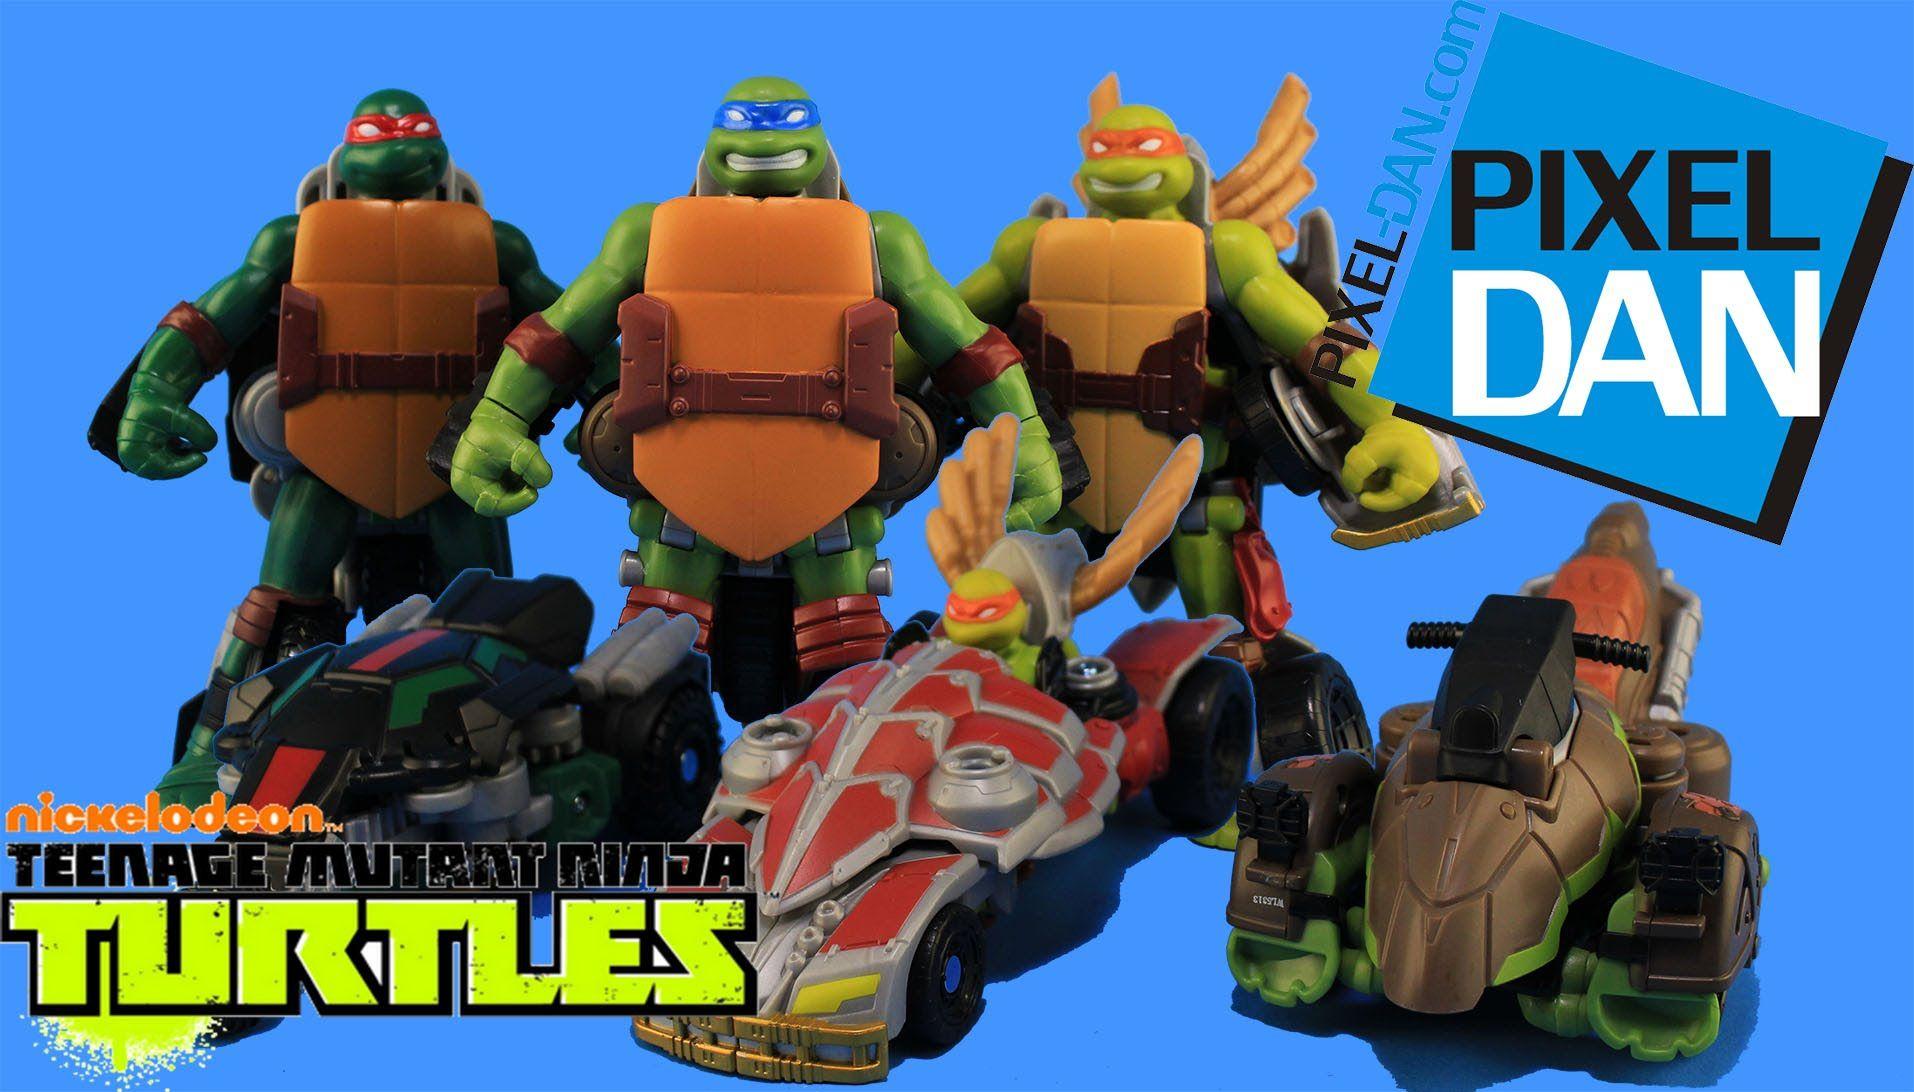 Twist n mutate teenage mutant ninja turtles mutations figures video twist n mutate teenage mutant ninja turtles mutations figures video review voltagebd Gallery